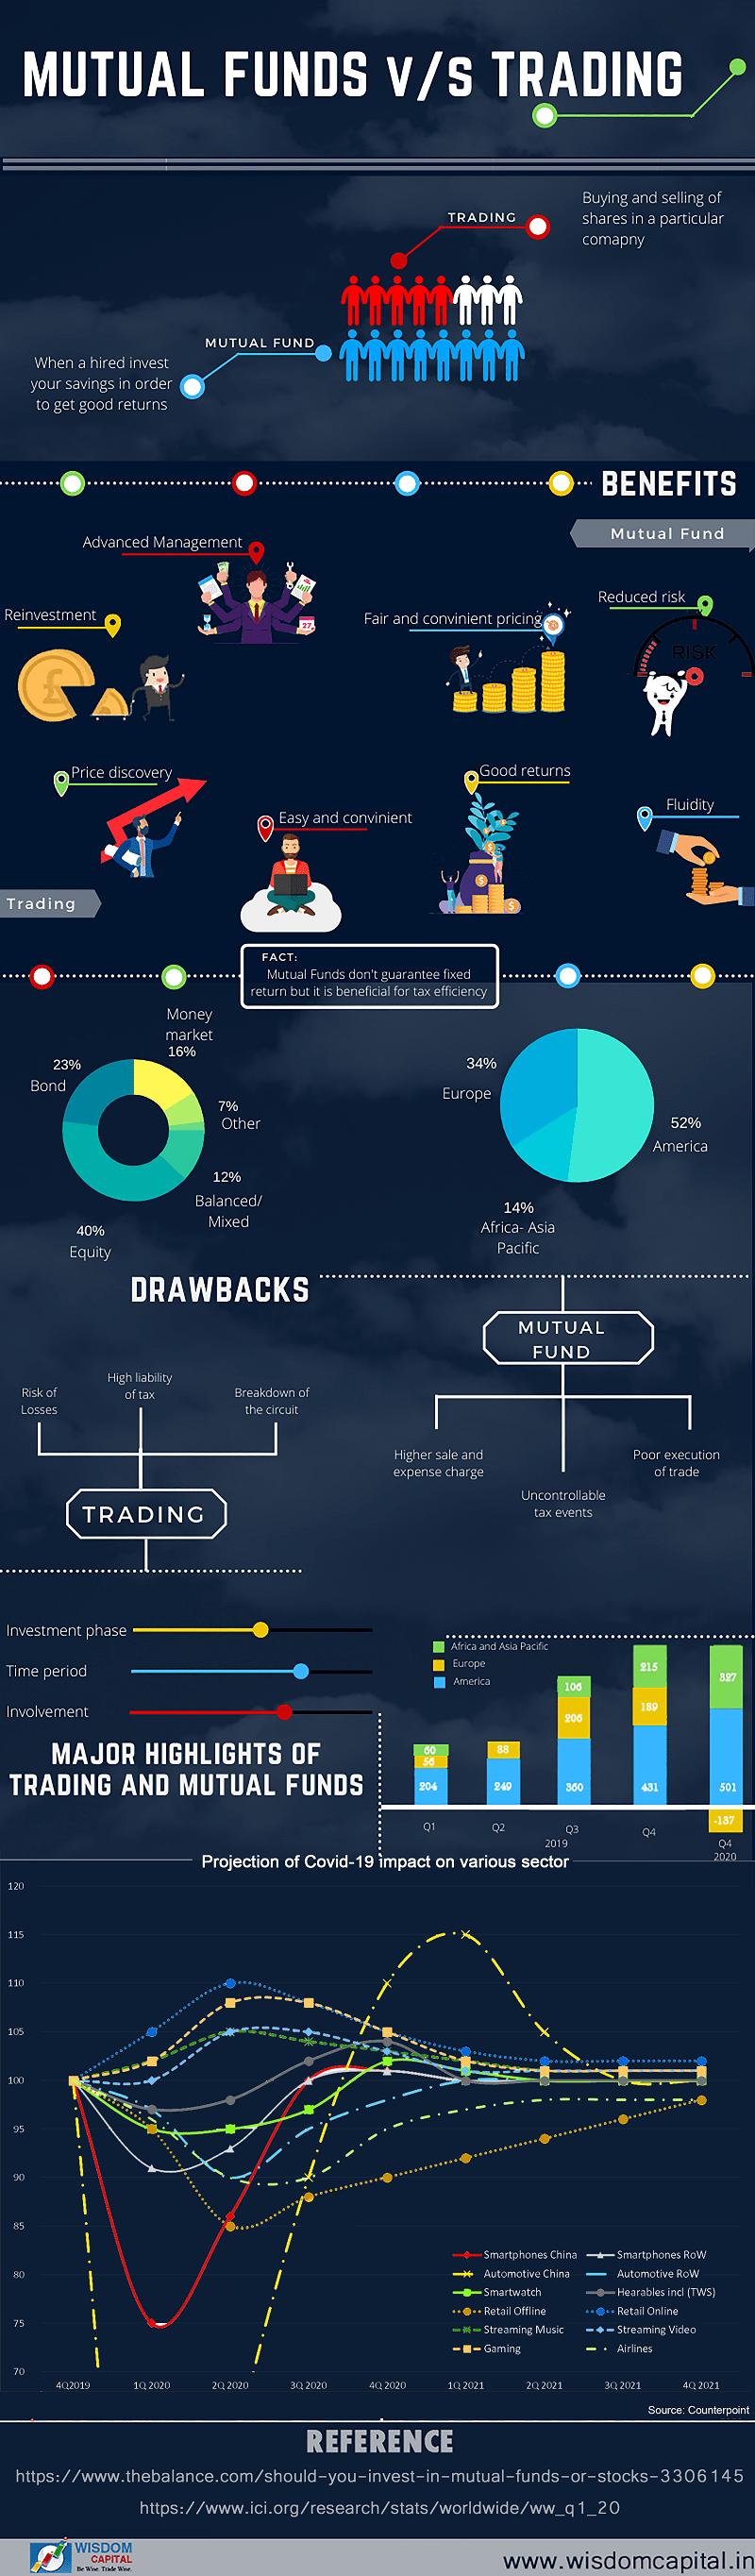 Mutualfund-vs-trading-infographic